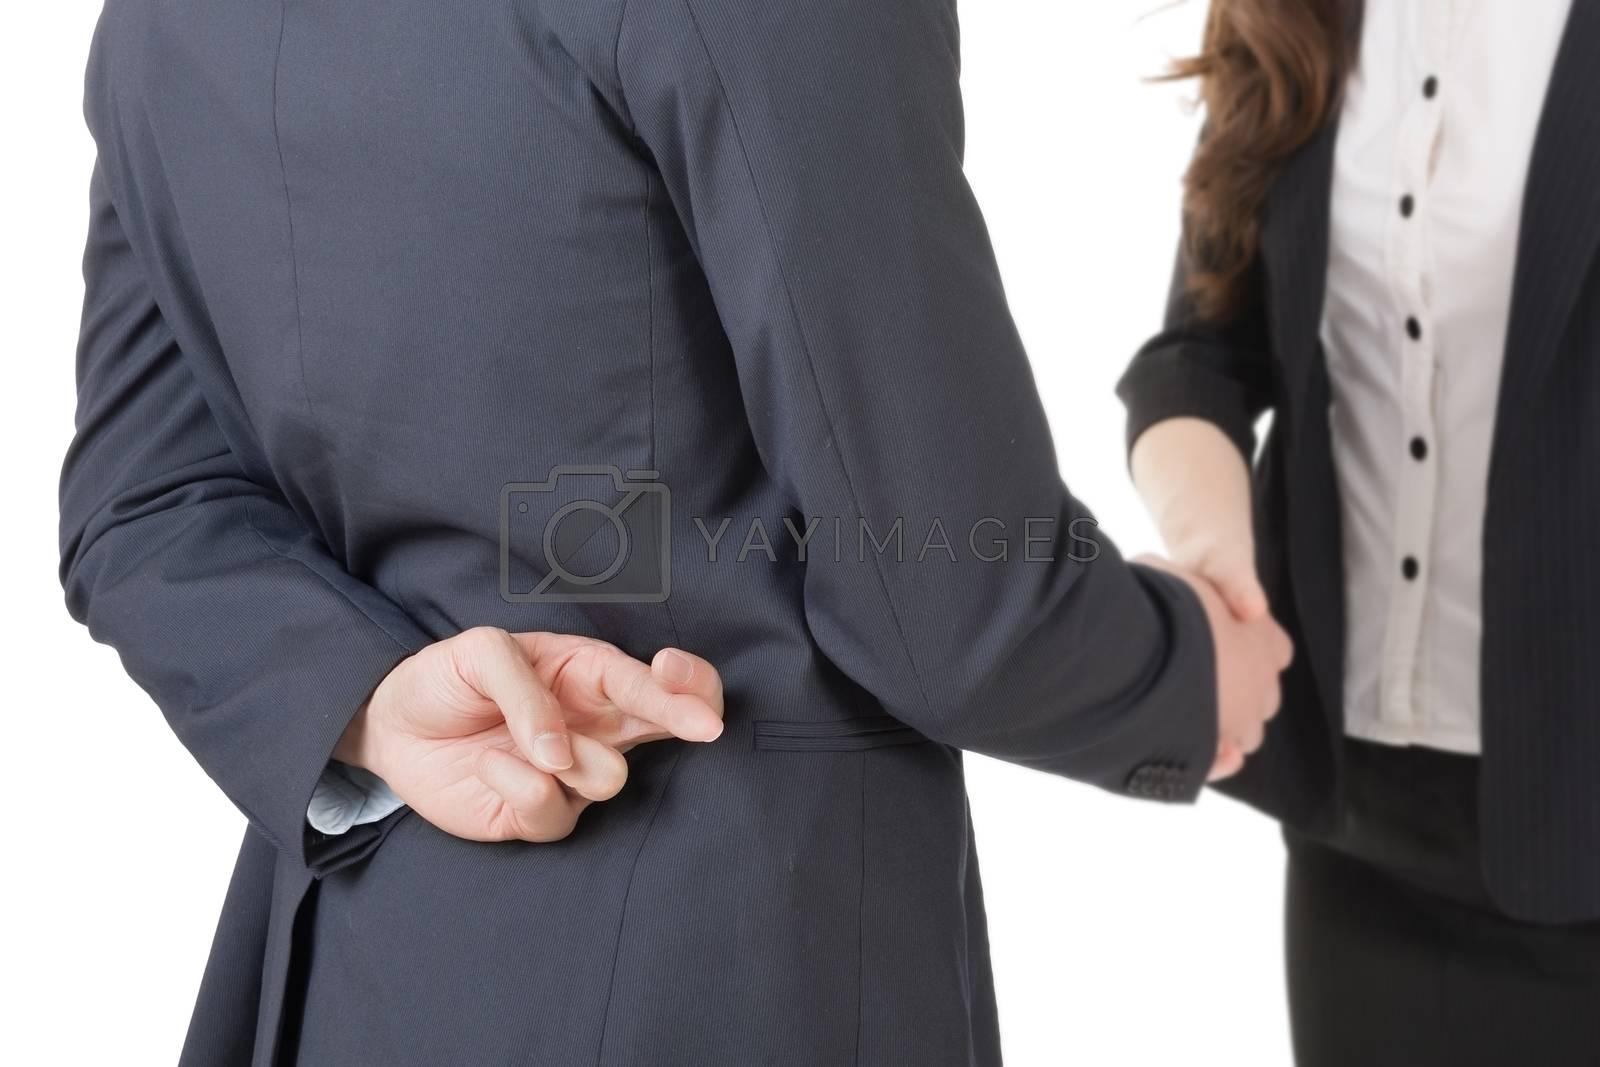 Royalty free image of fake hand shake by elwynn